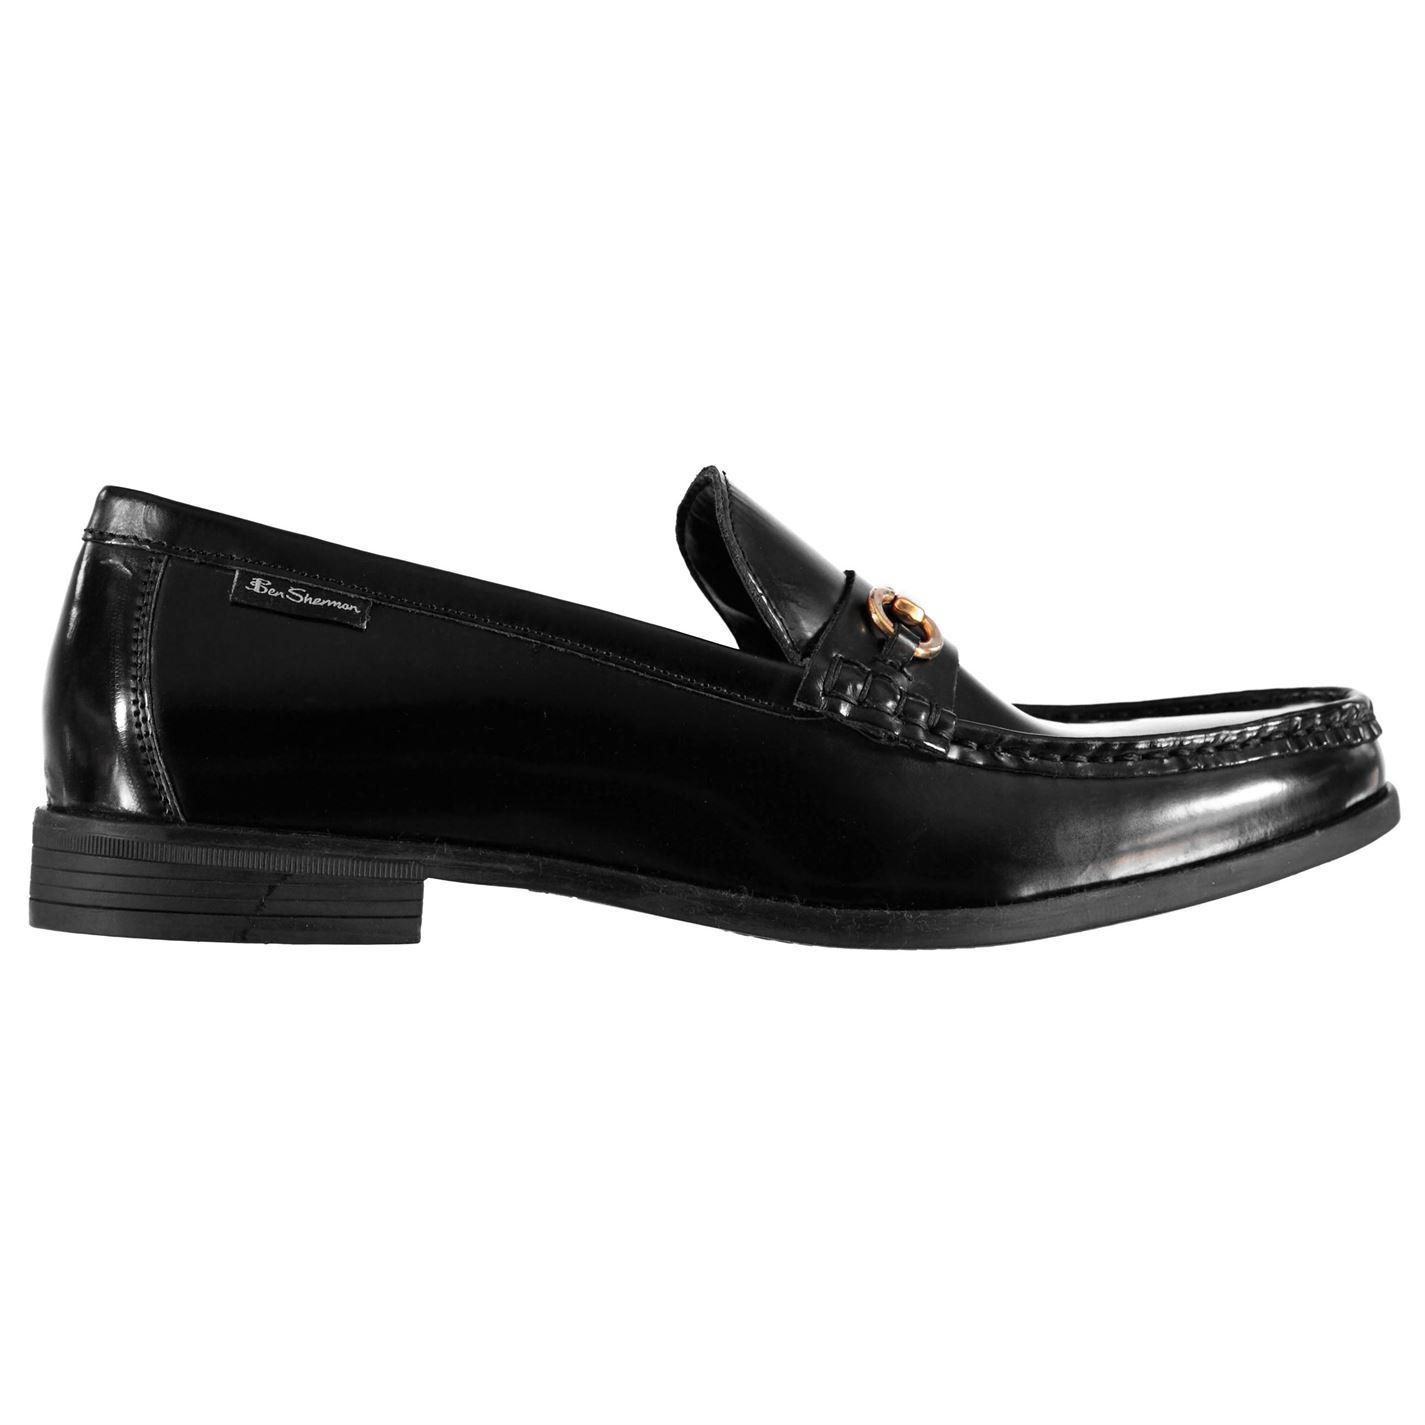 Ben-Sherman-Luca-Loafers-Slip-On-Shoes-Mens-Formal-Footwear-Flats thumbnail 5